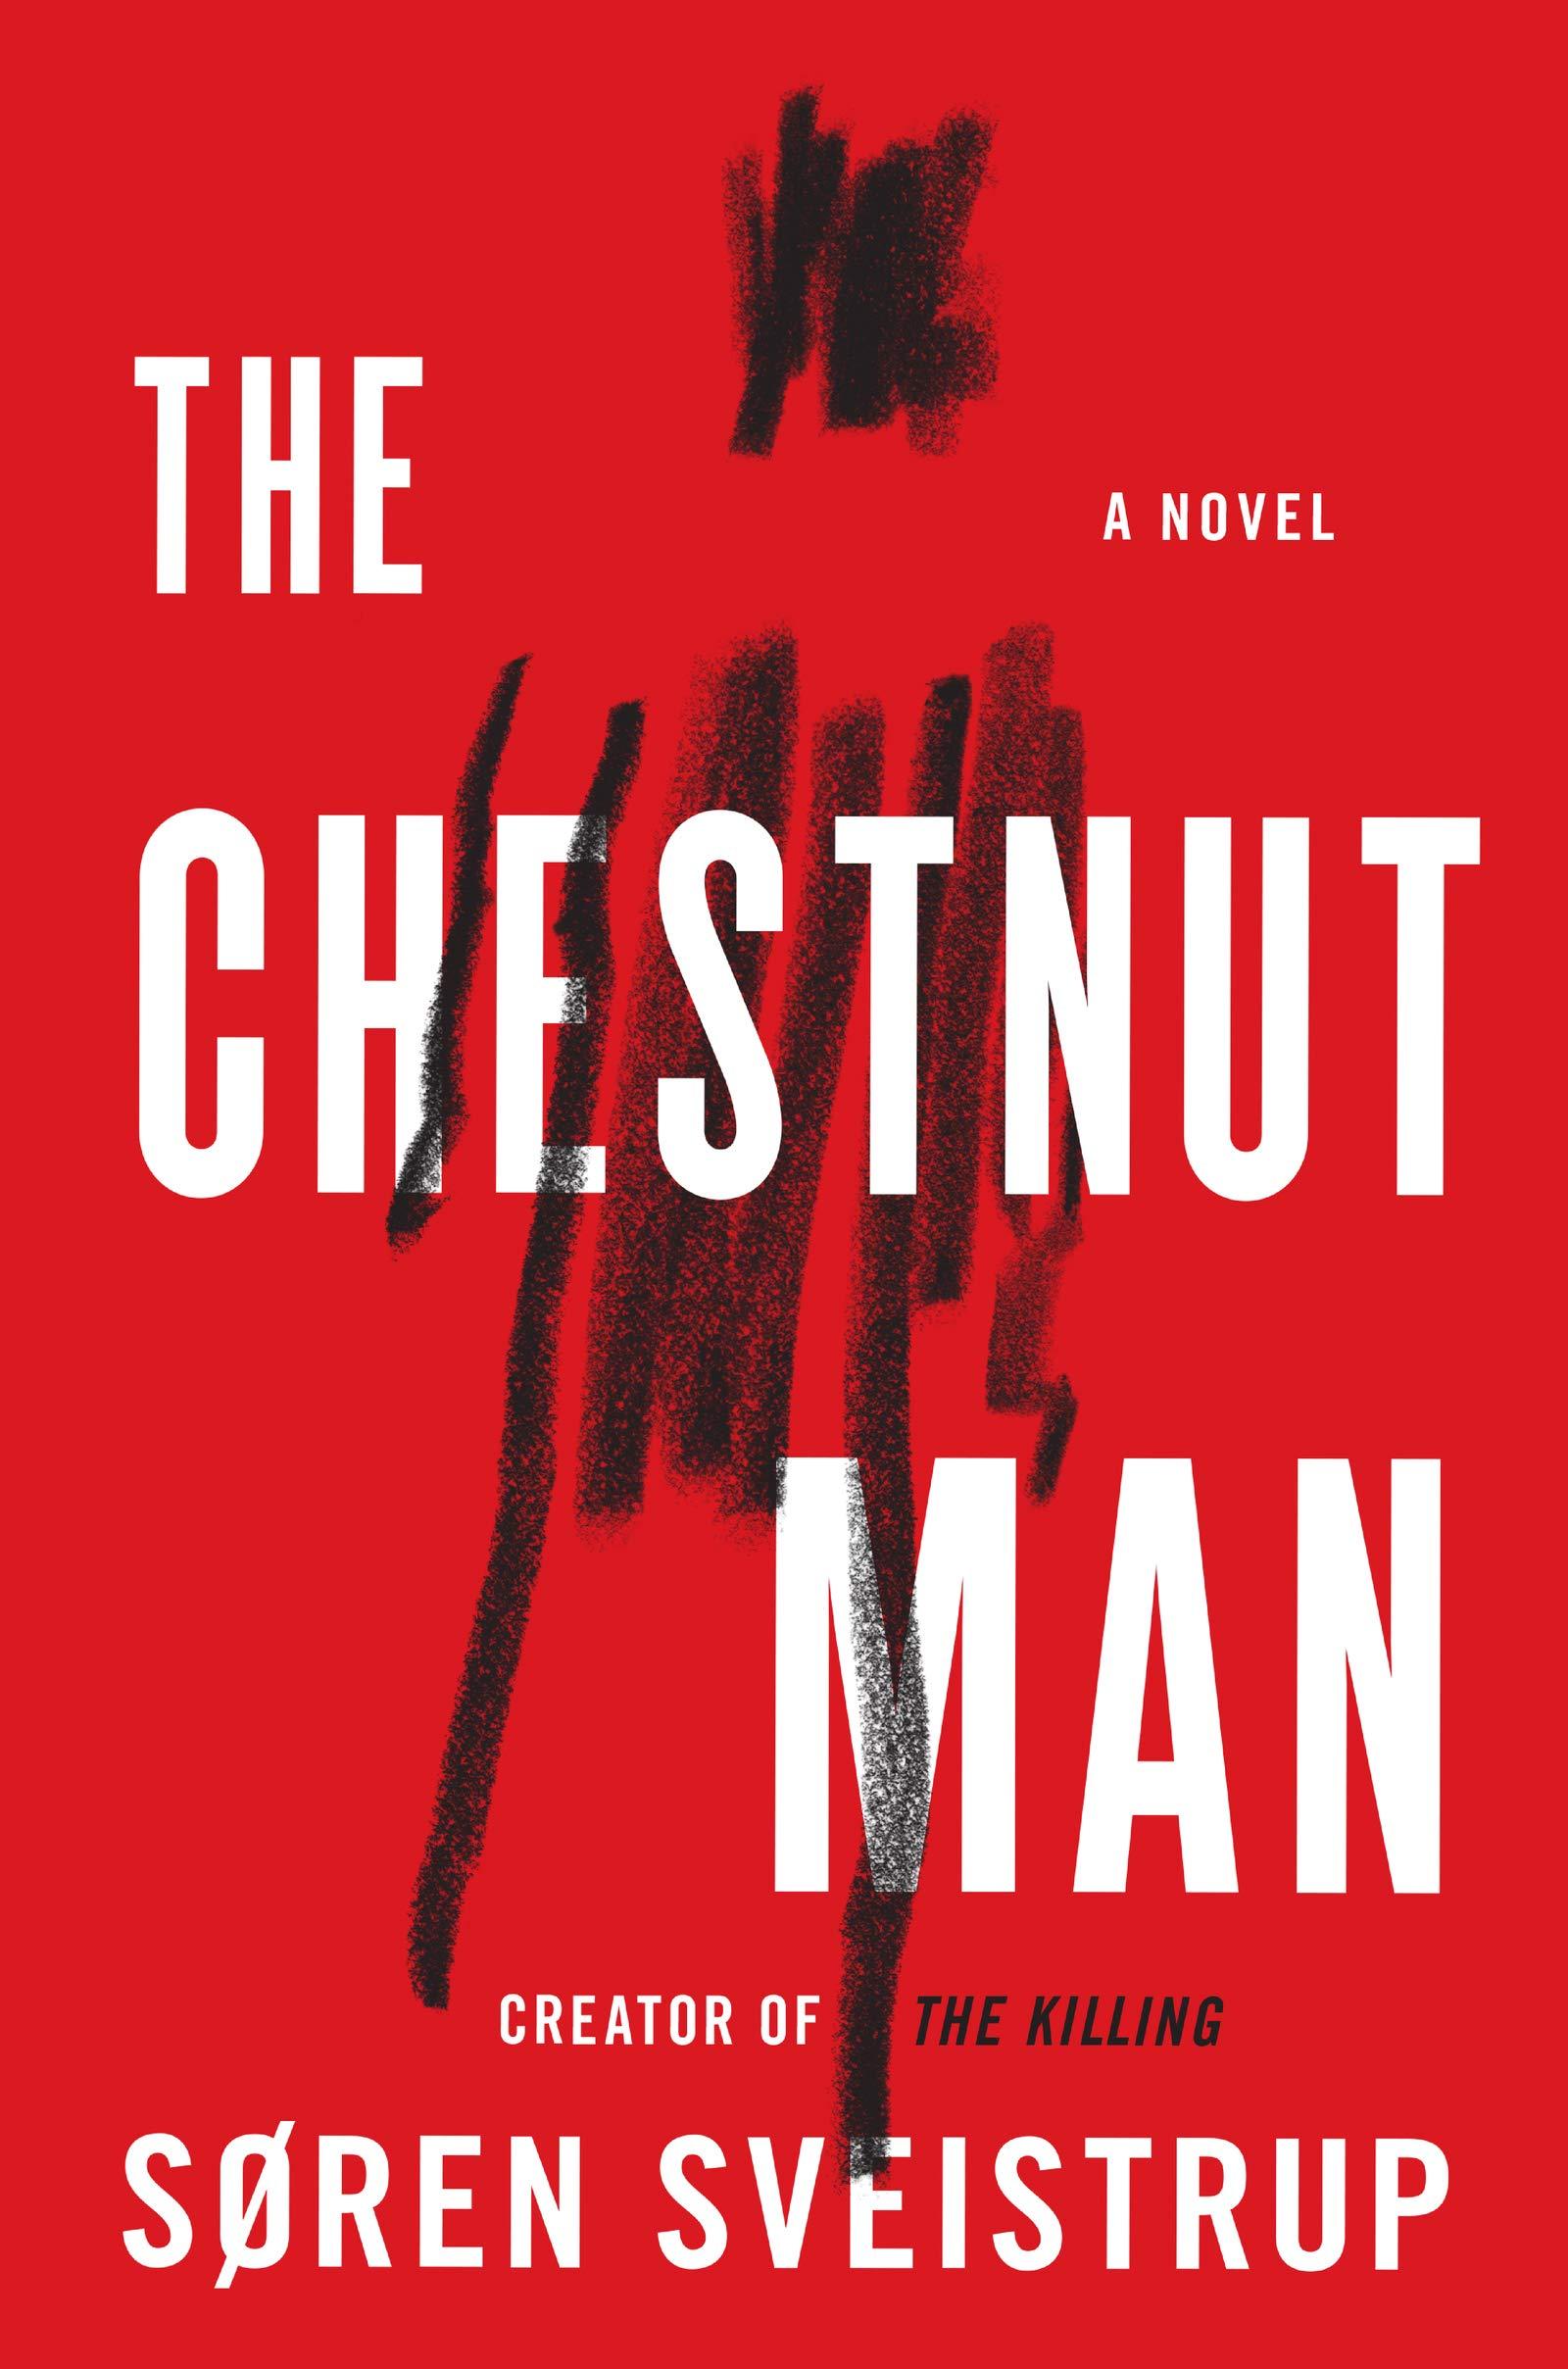 The Chestnut Man book cover.jpg